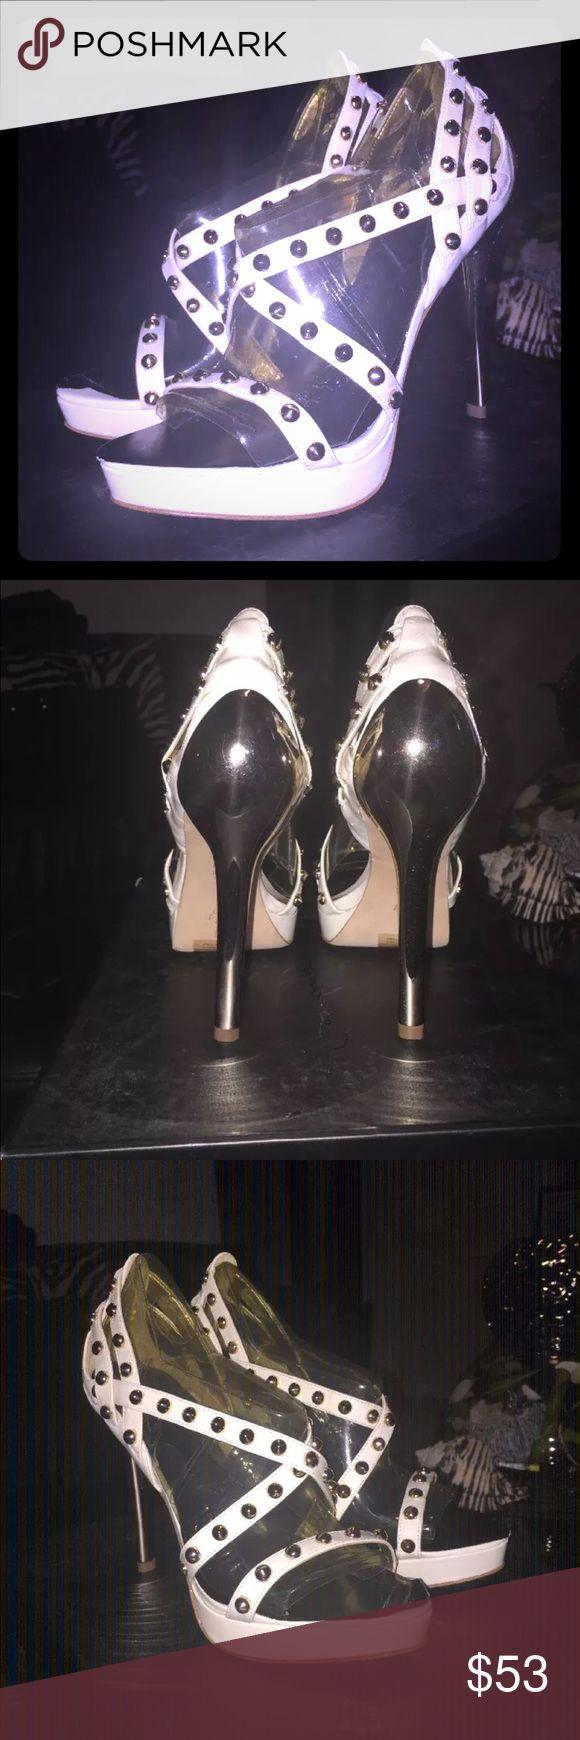 NWT! Report Signature Kass white patent heels sz 6 NWT! Report Signature Kass white patent gold stud heels sz 6. Excellent condition! Report Signature Shoes Heels